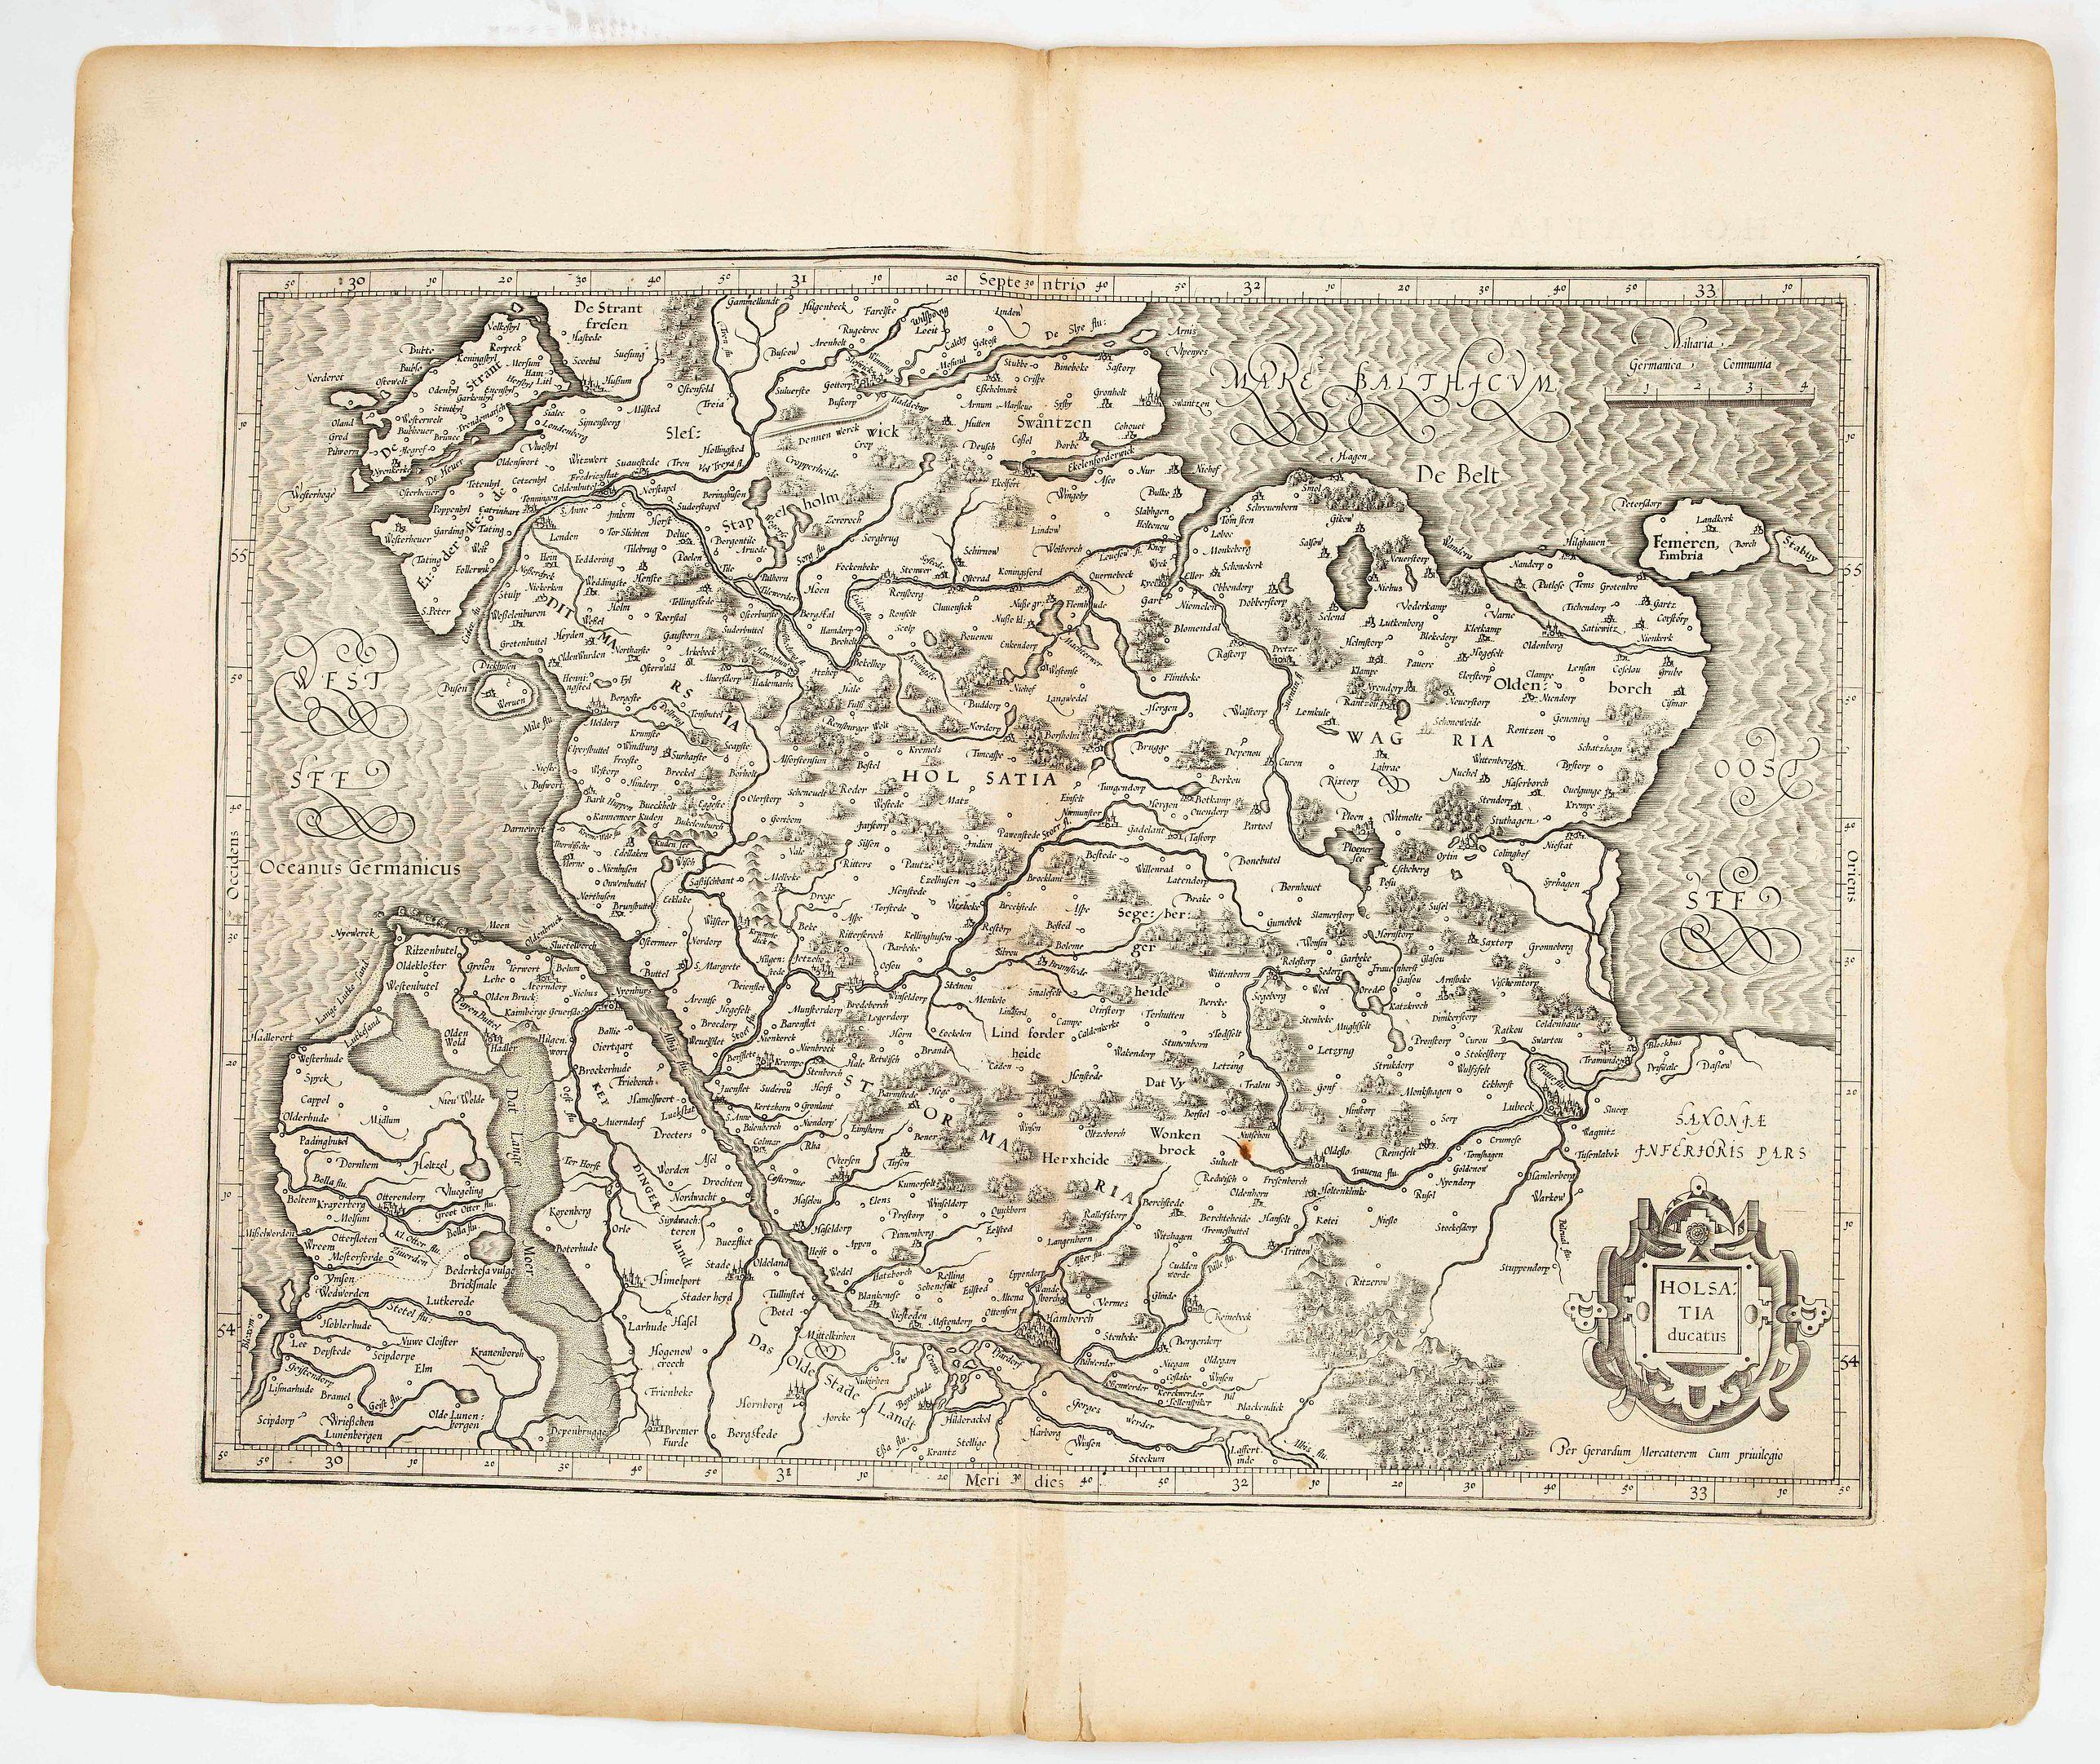 MERCATOR,G./ HONDIUS,J. -  Holsatia ducatus.